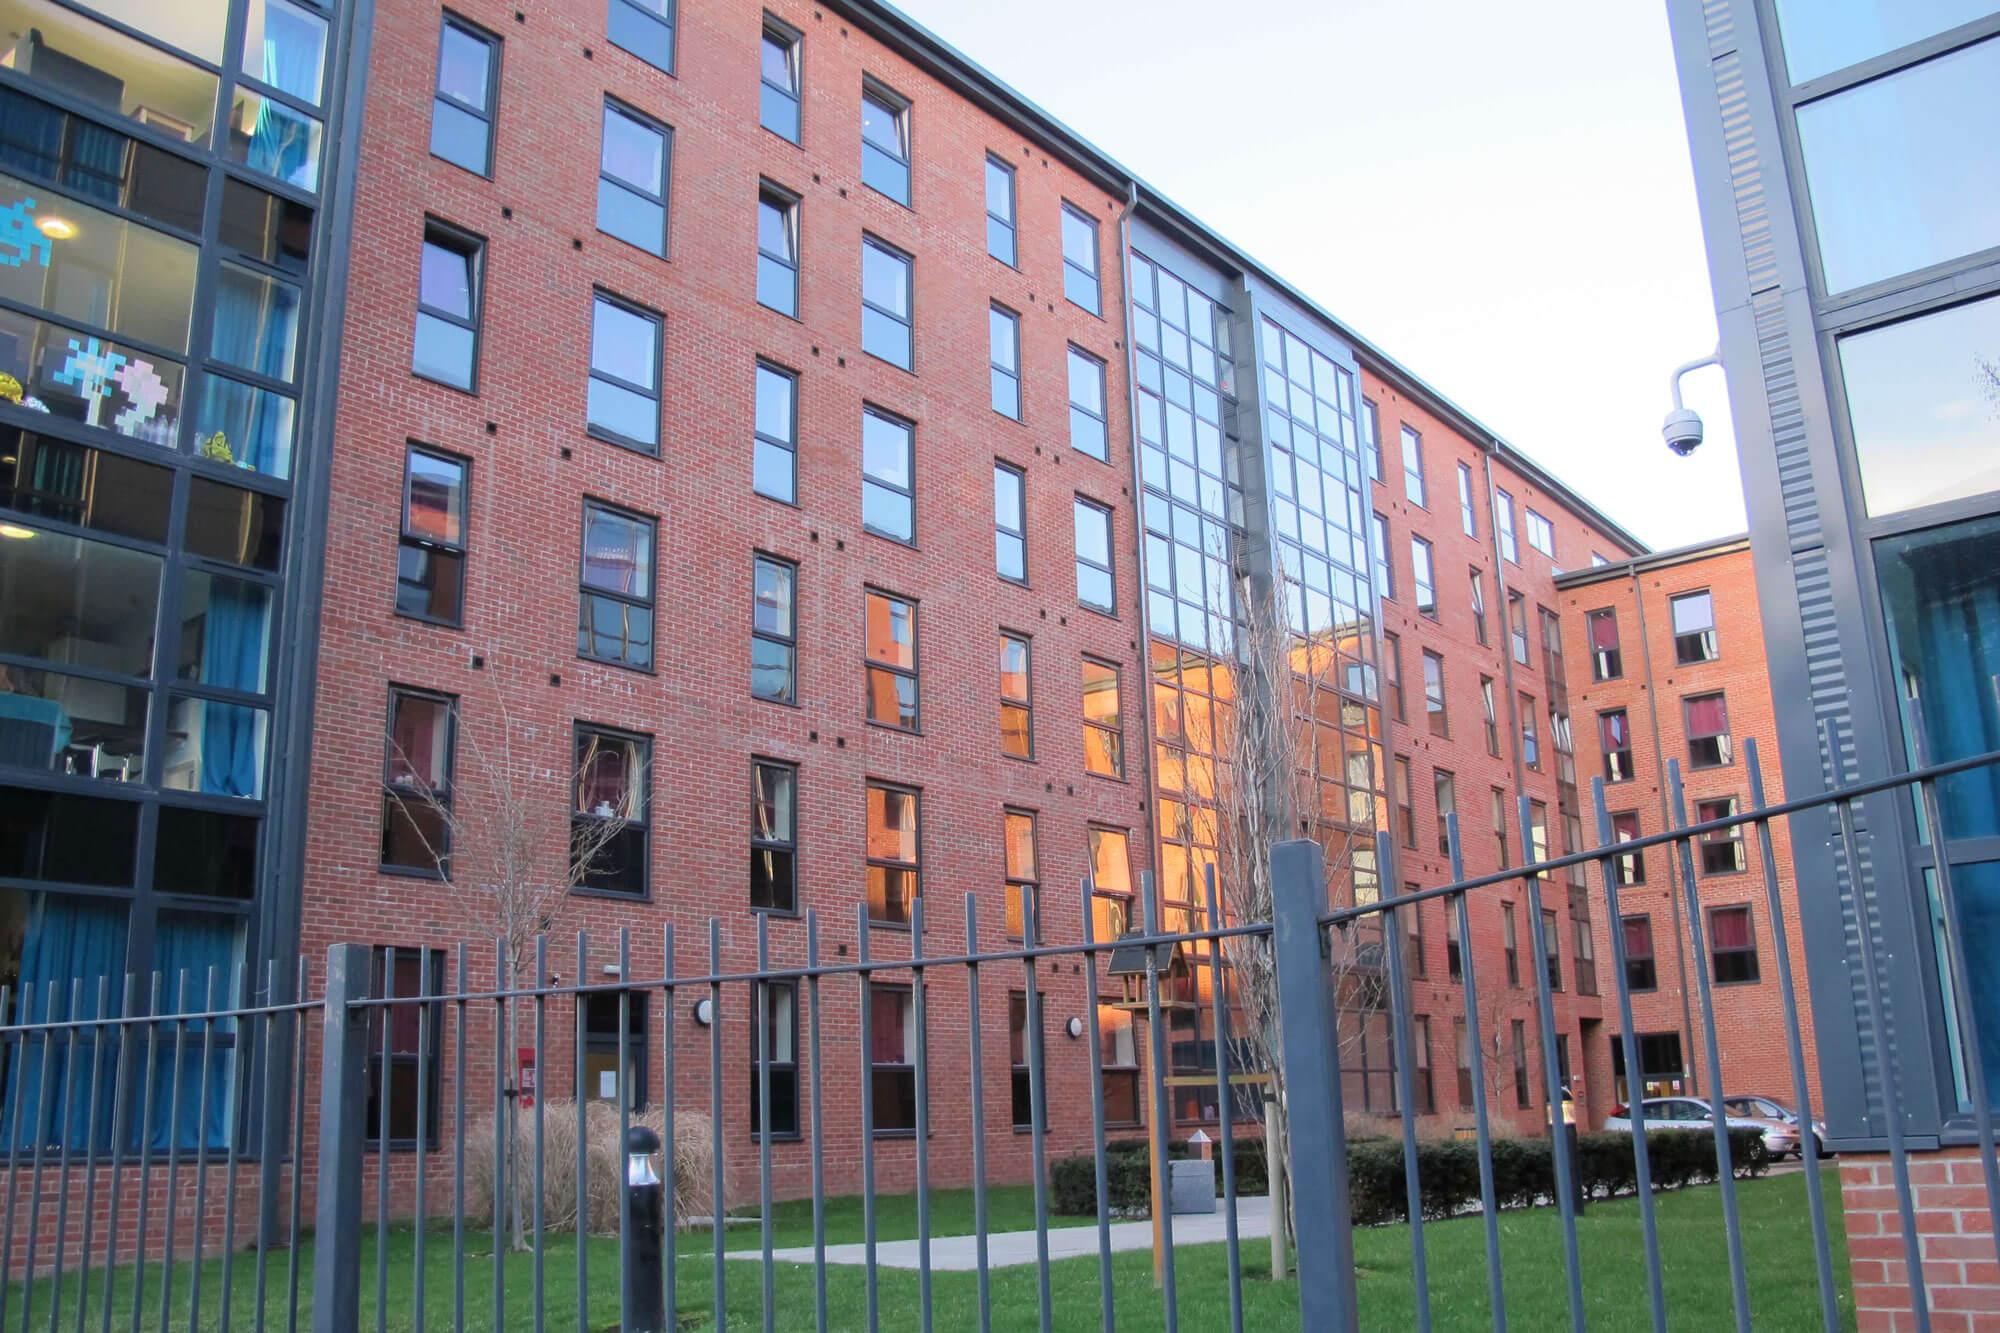 Darley Bank halls of residence